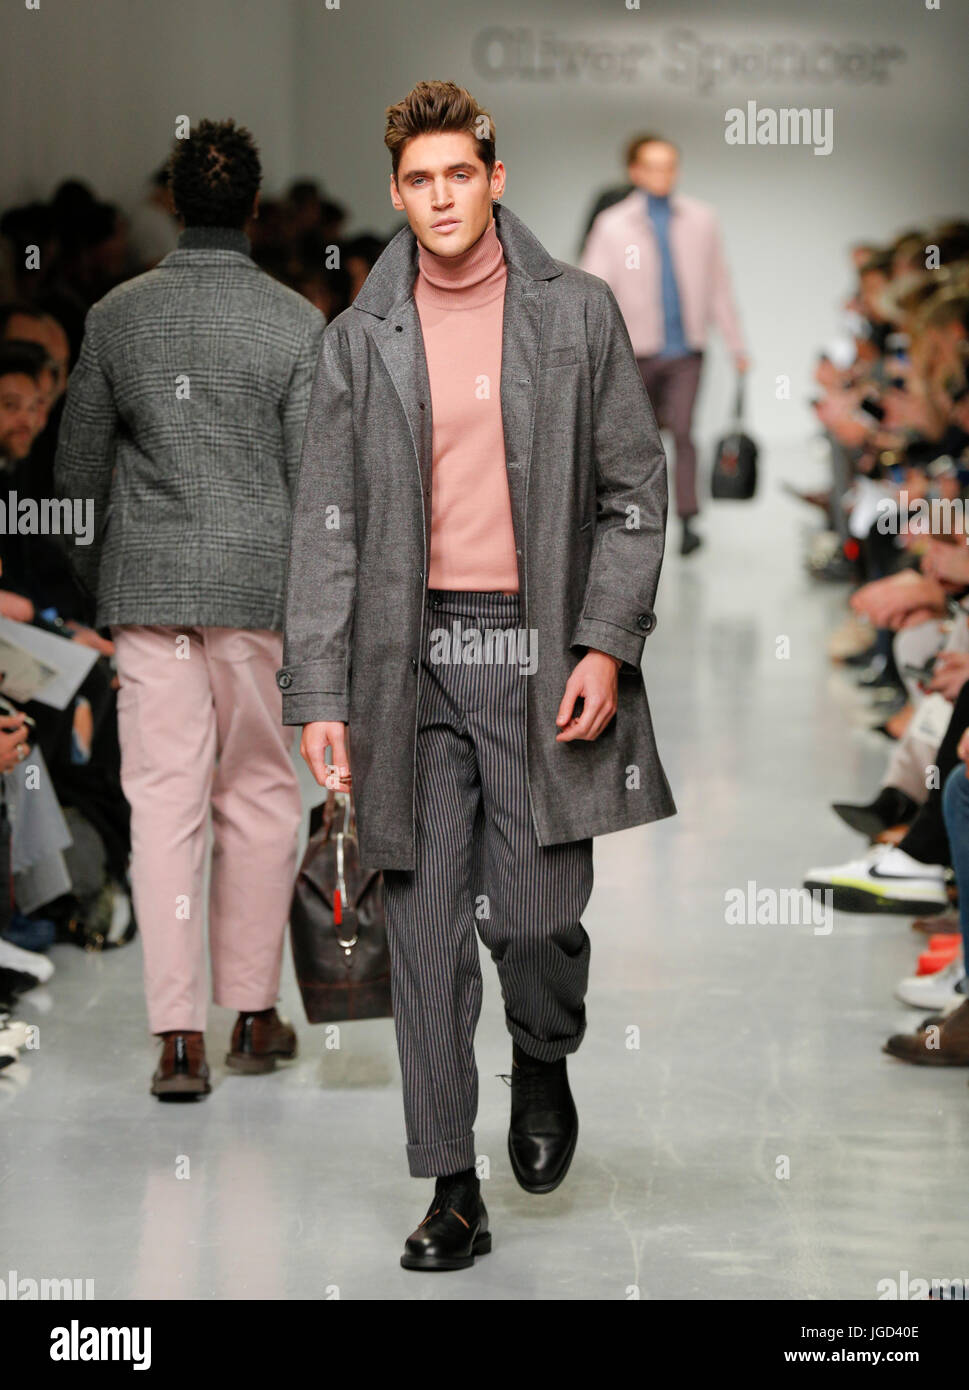 07/01/2017 Designer Oliver Spencer catwalk at London Fashion Week Mens AW17 at British Fashion Council Strand 180 - Stock Image